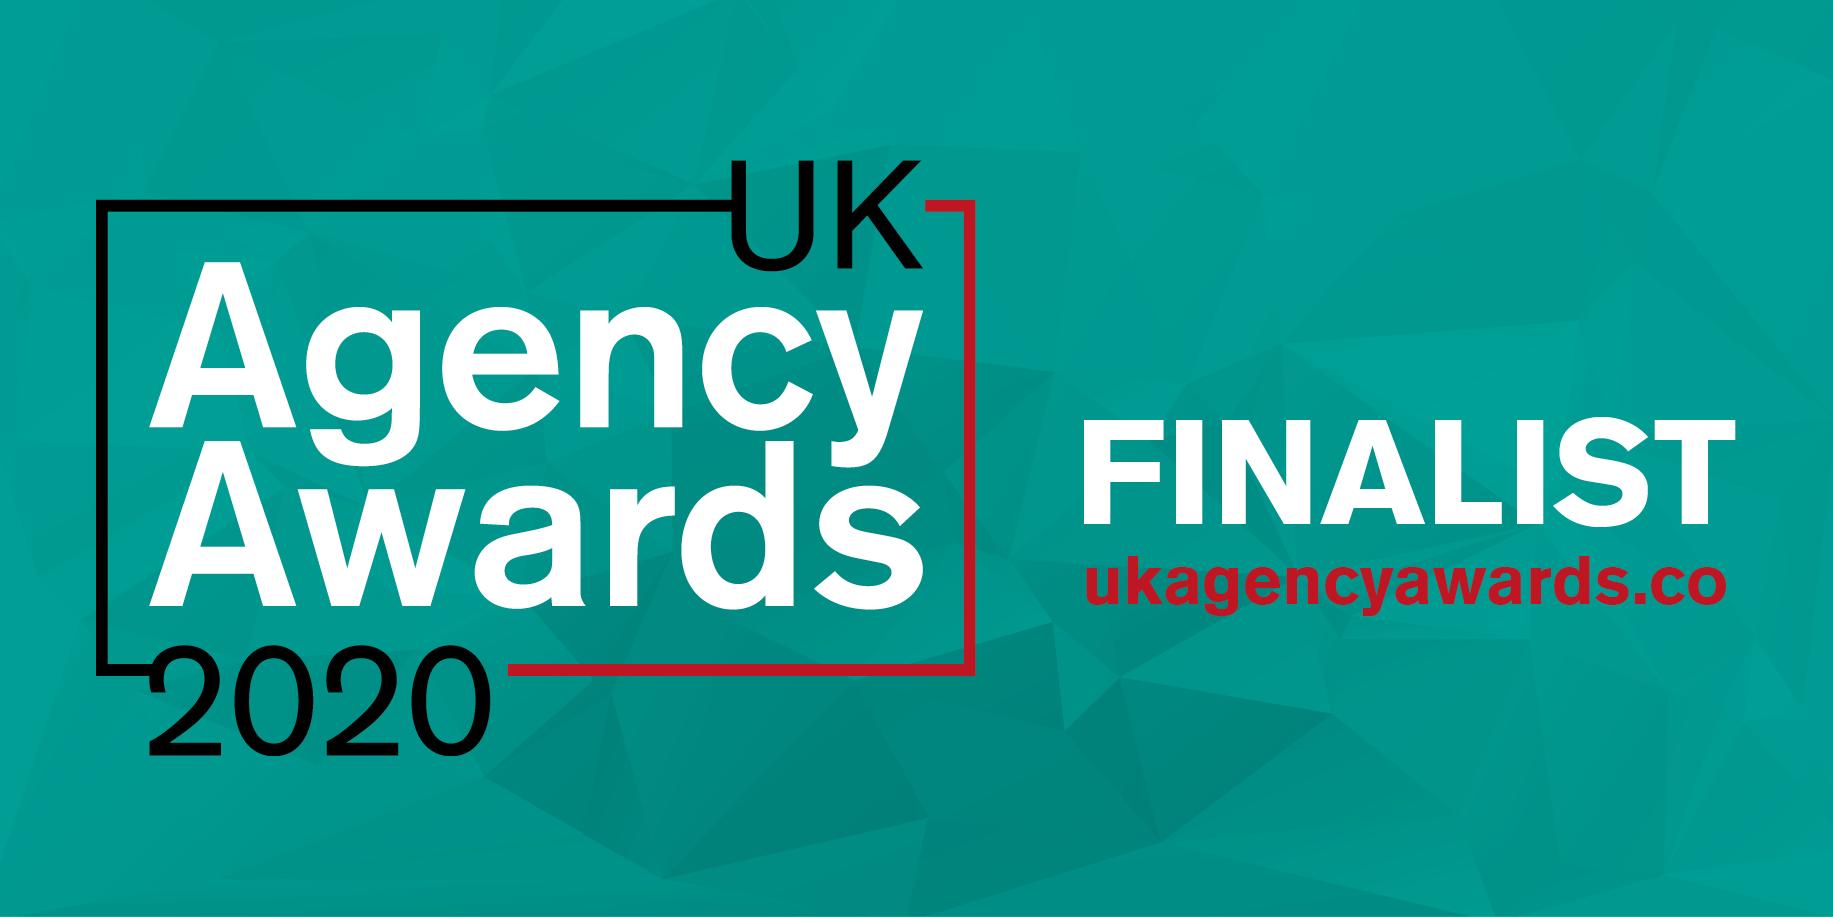 UK Agency Awards 2020 - Finalist Social Graphic (1)